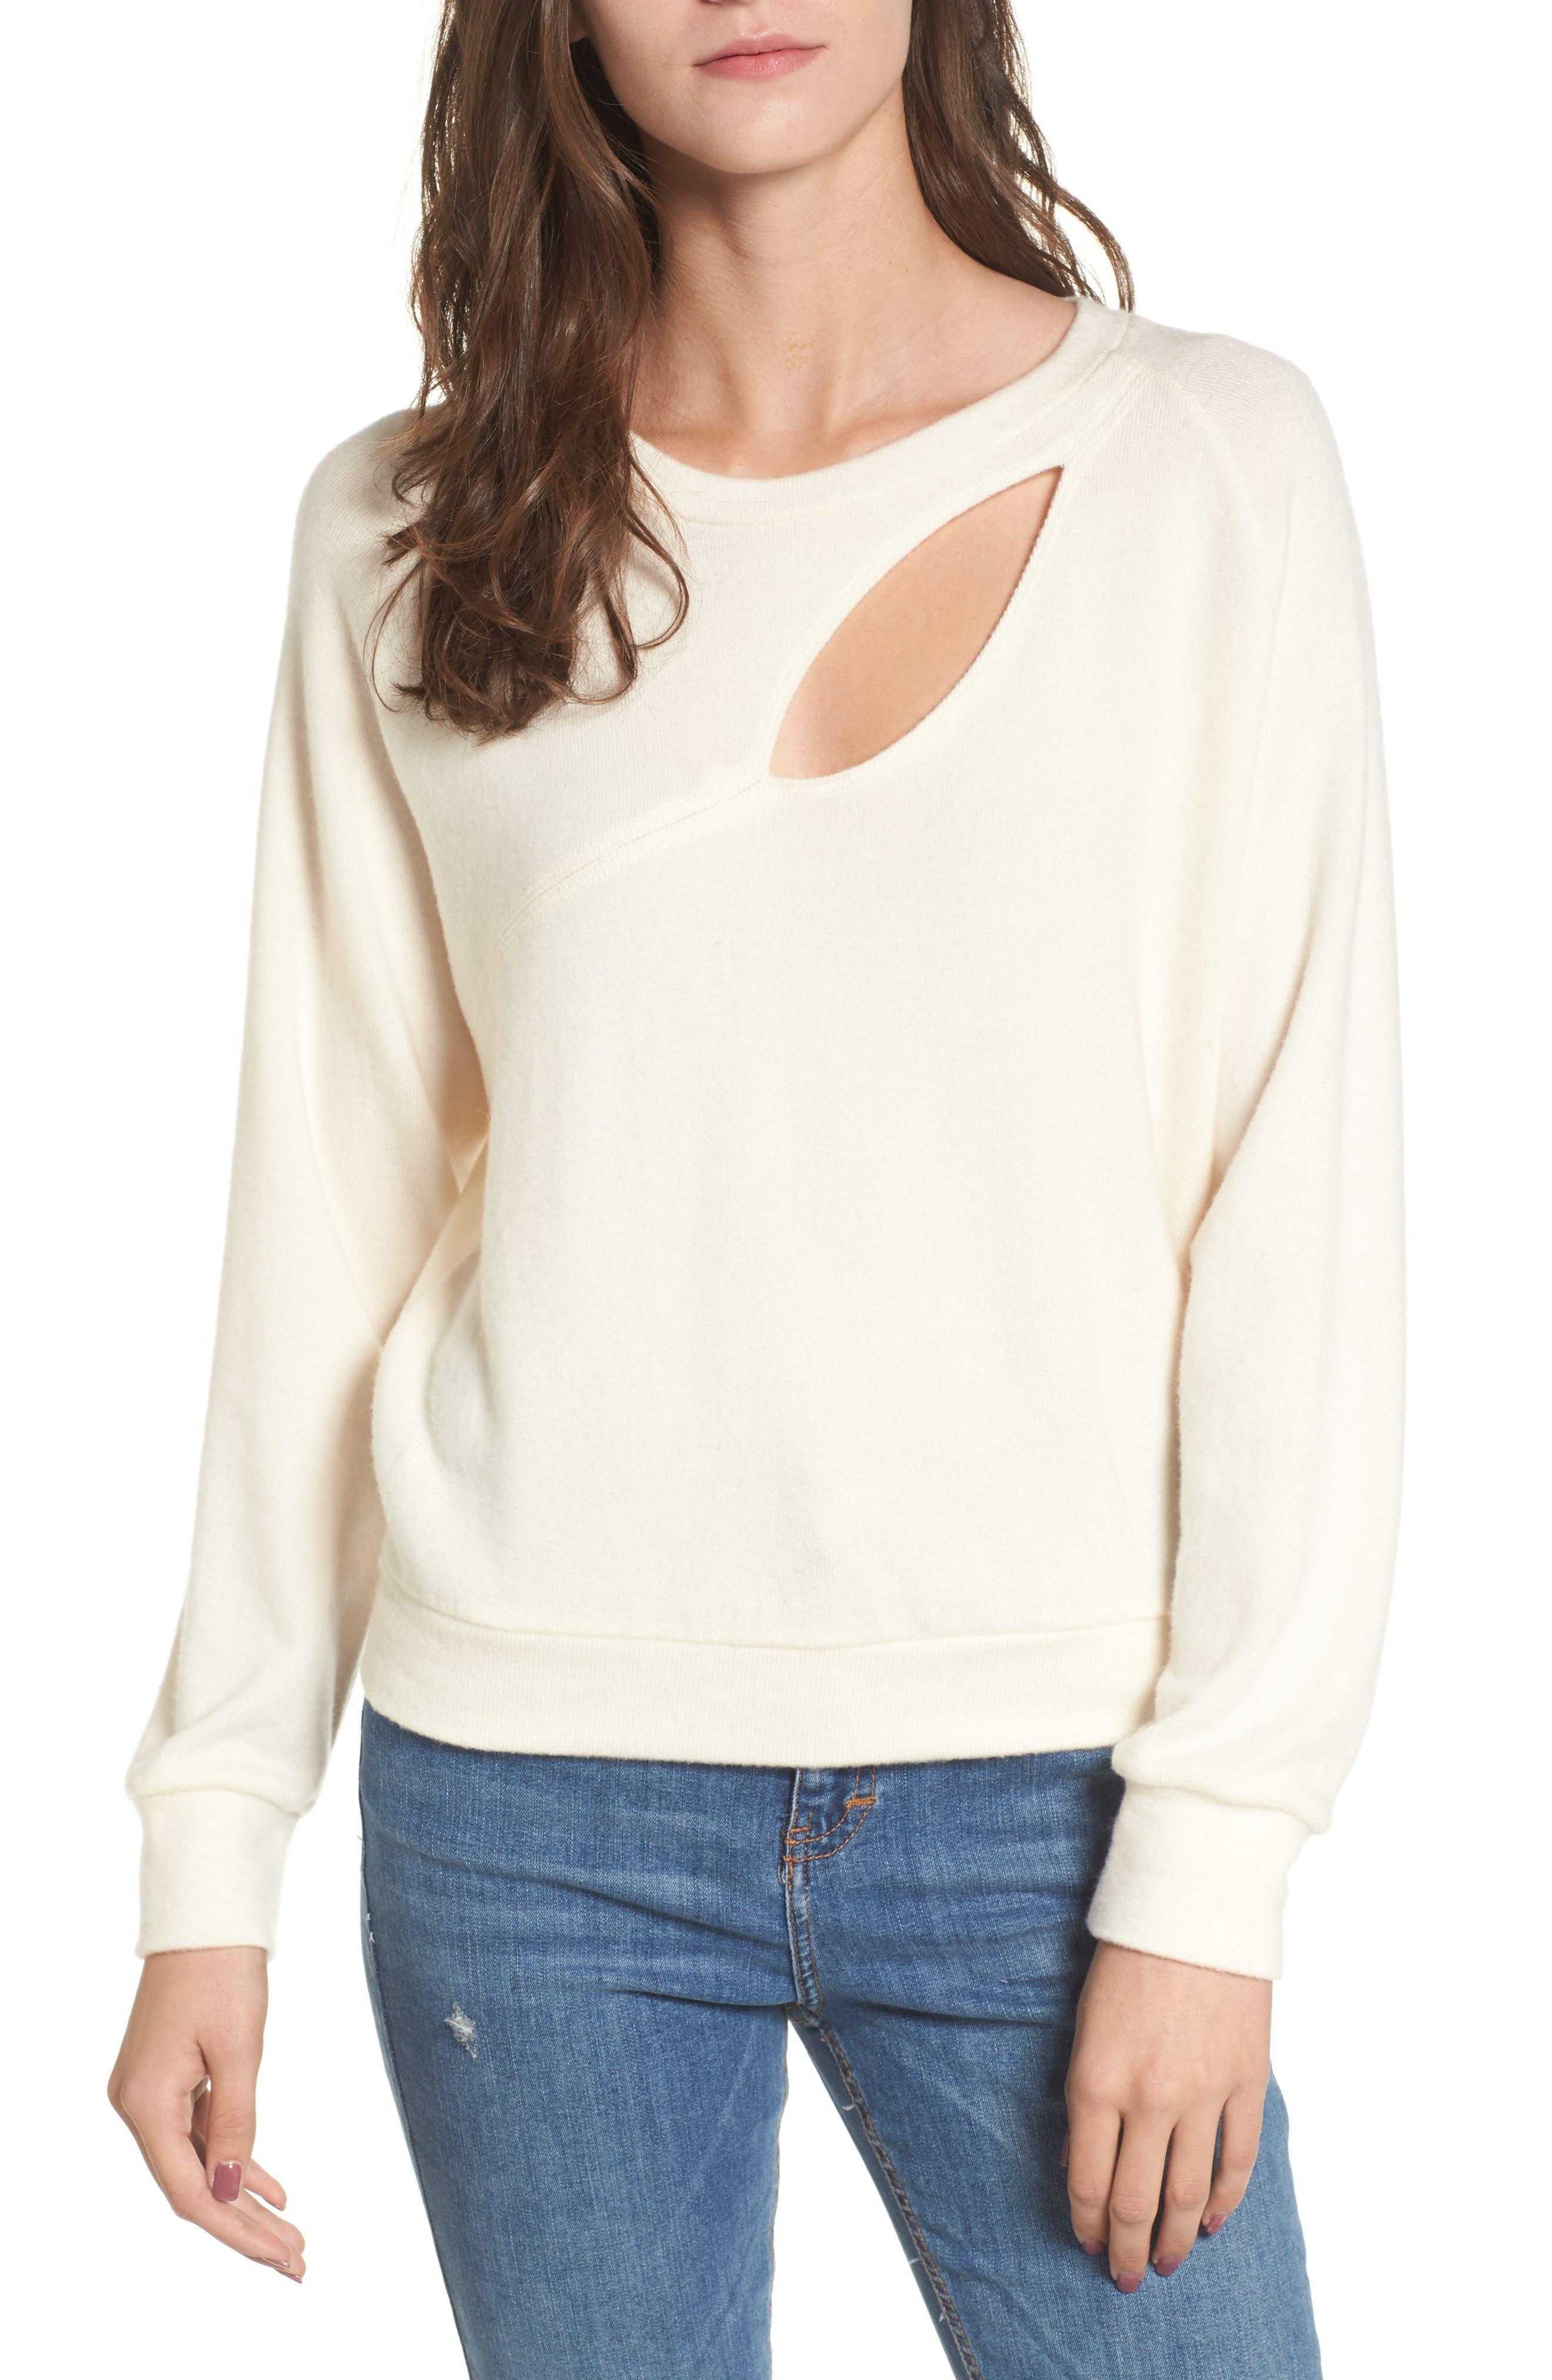 Alternate Image 1 Selected - LNA Phased Brushed Cutout Sweater